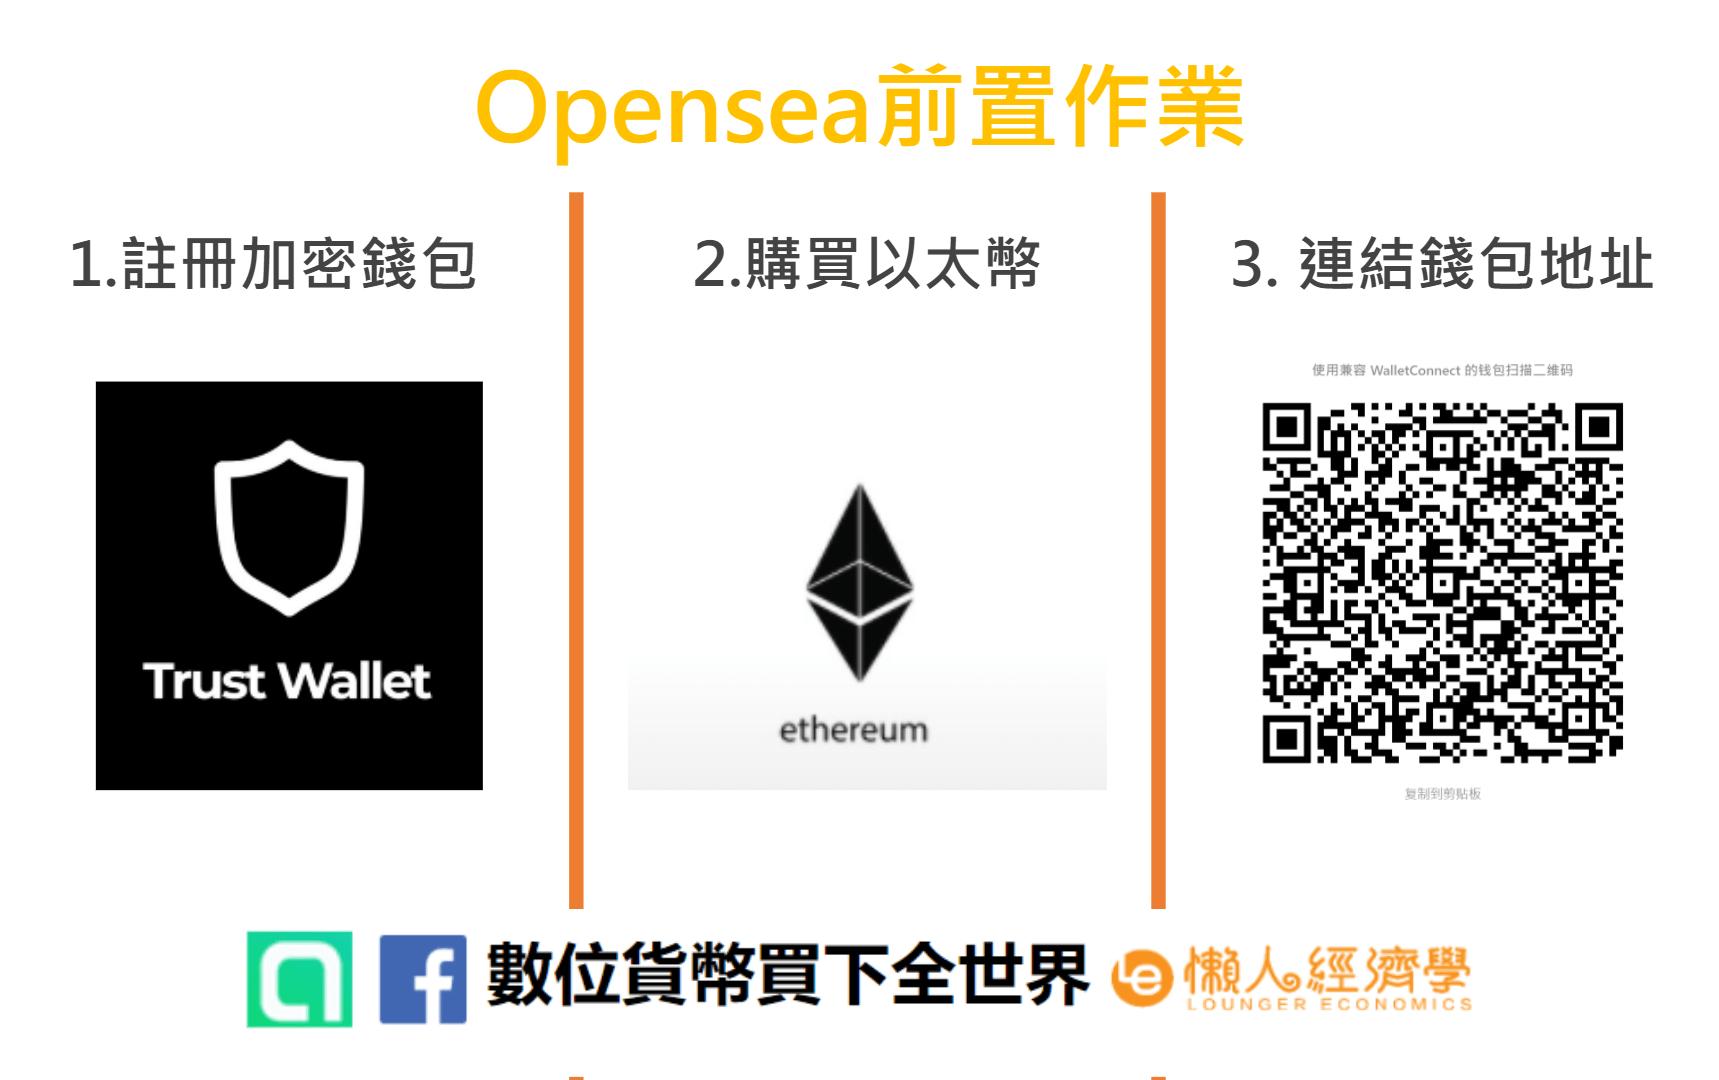 NFT購買教學,以Opensea為範例,在正式進入購買教學前,必須先完成三個前置作業,首先,先註冊加密錢包,購買以太幣,最後,連結錢包地址至Opensea